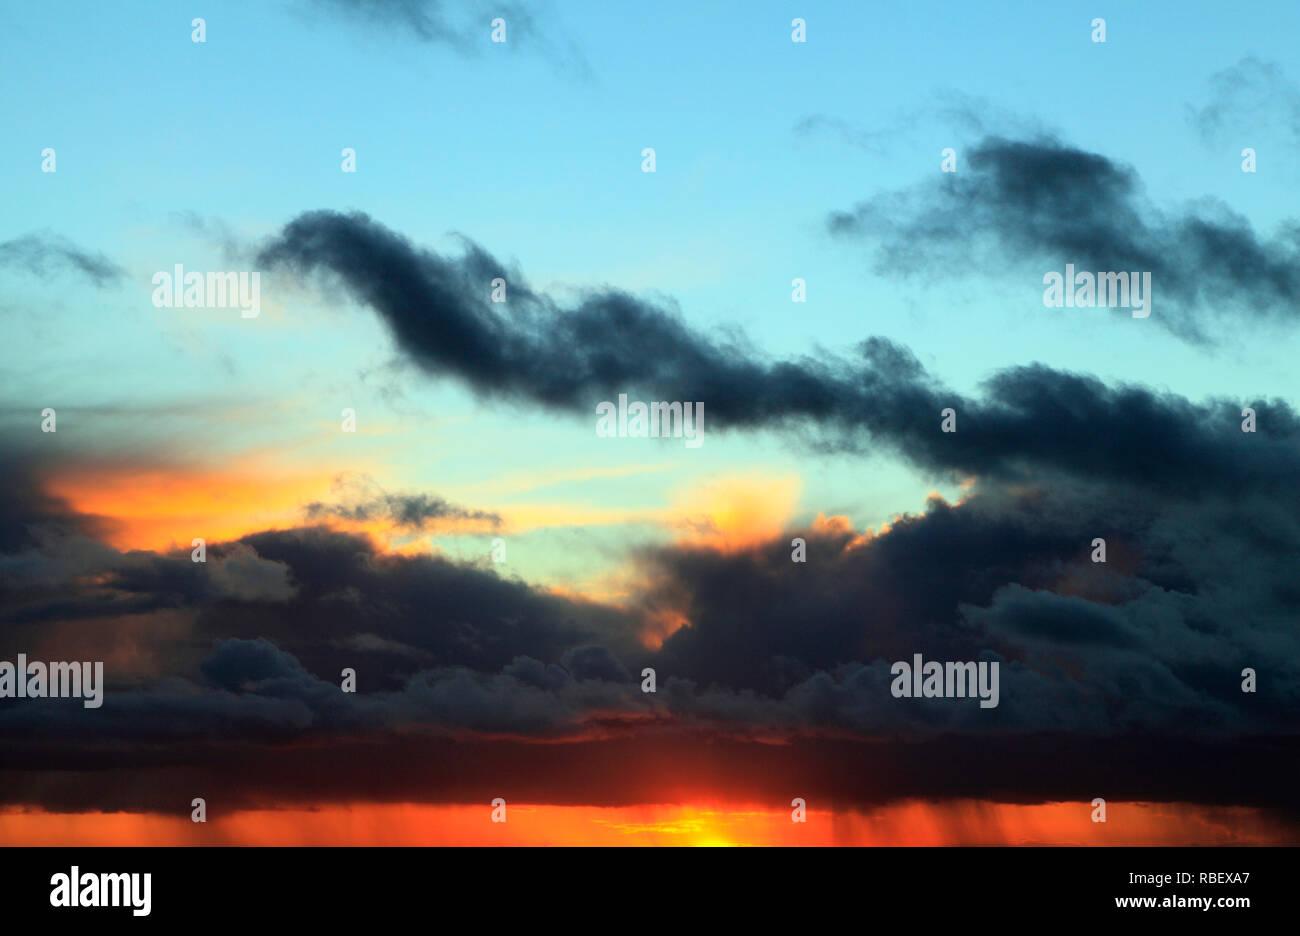 Sunset, red, blue, pink, sky, black clouds, gathering storm, weather, skies, sky, formation, formations, evening light, Norfolk, England, UK - Stock Image